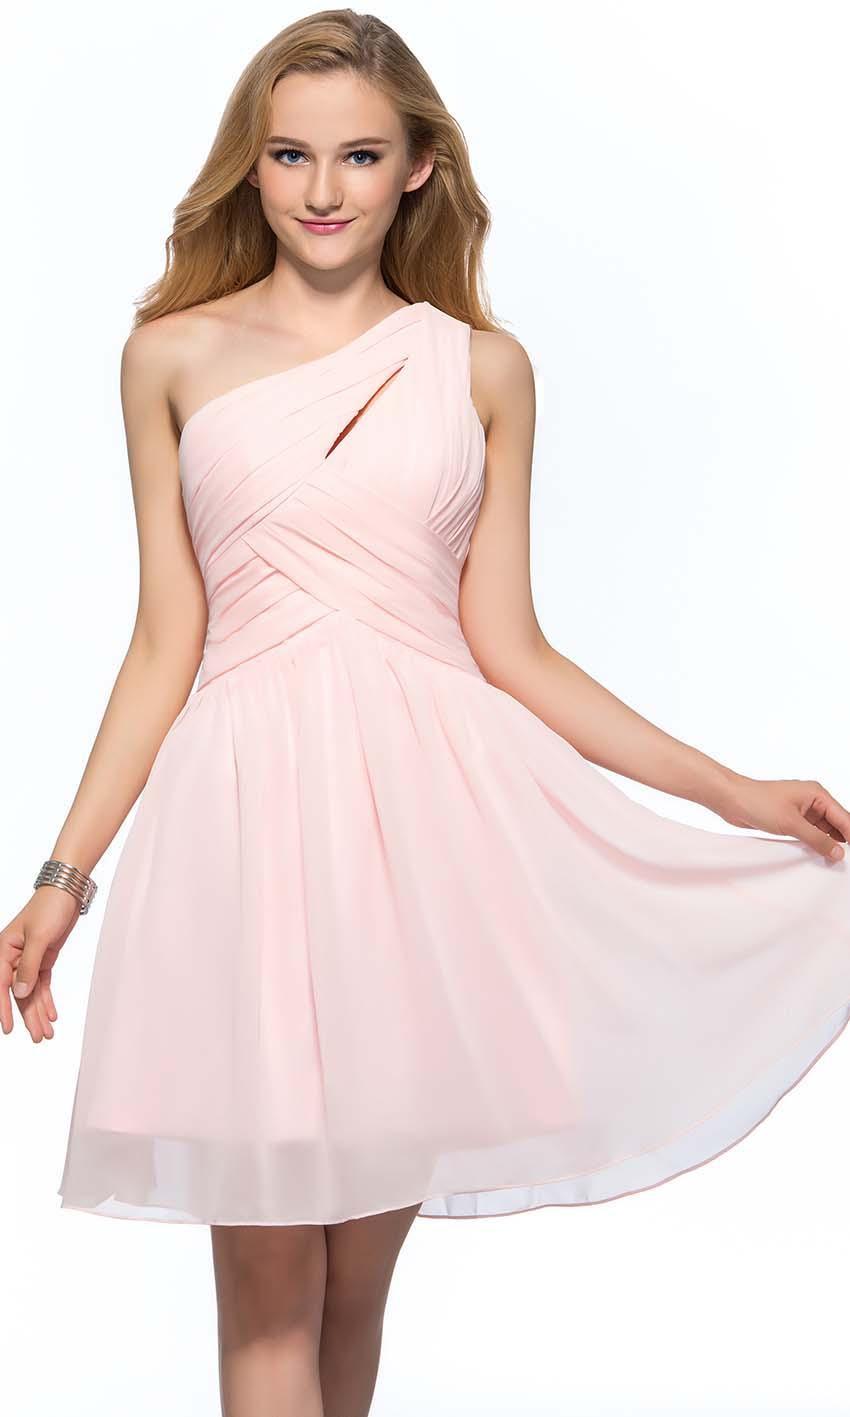 Evening dresses for prom uk